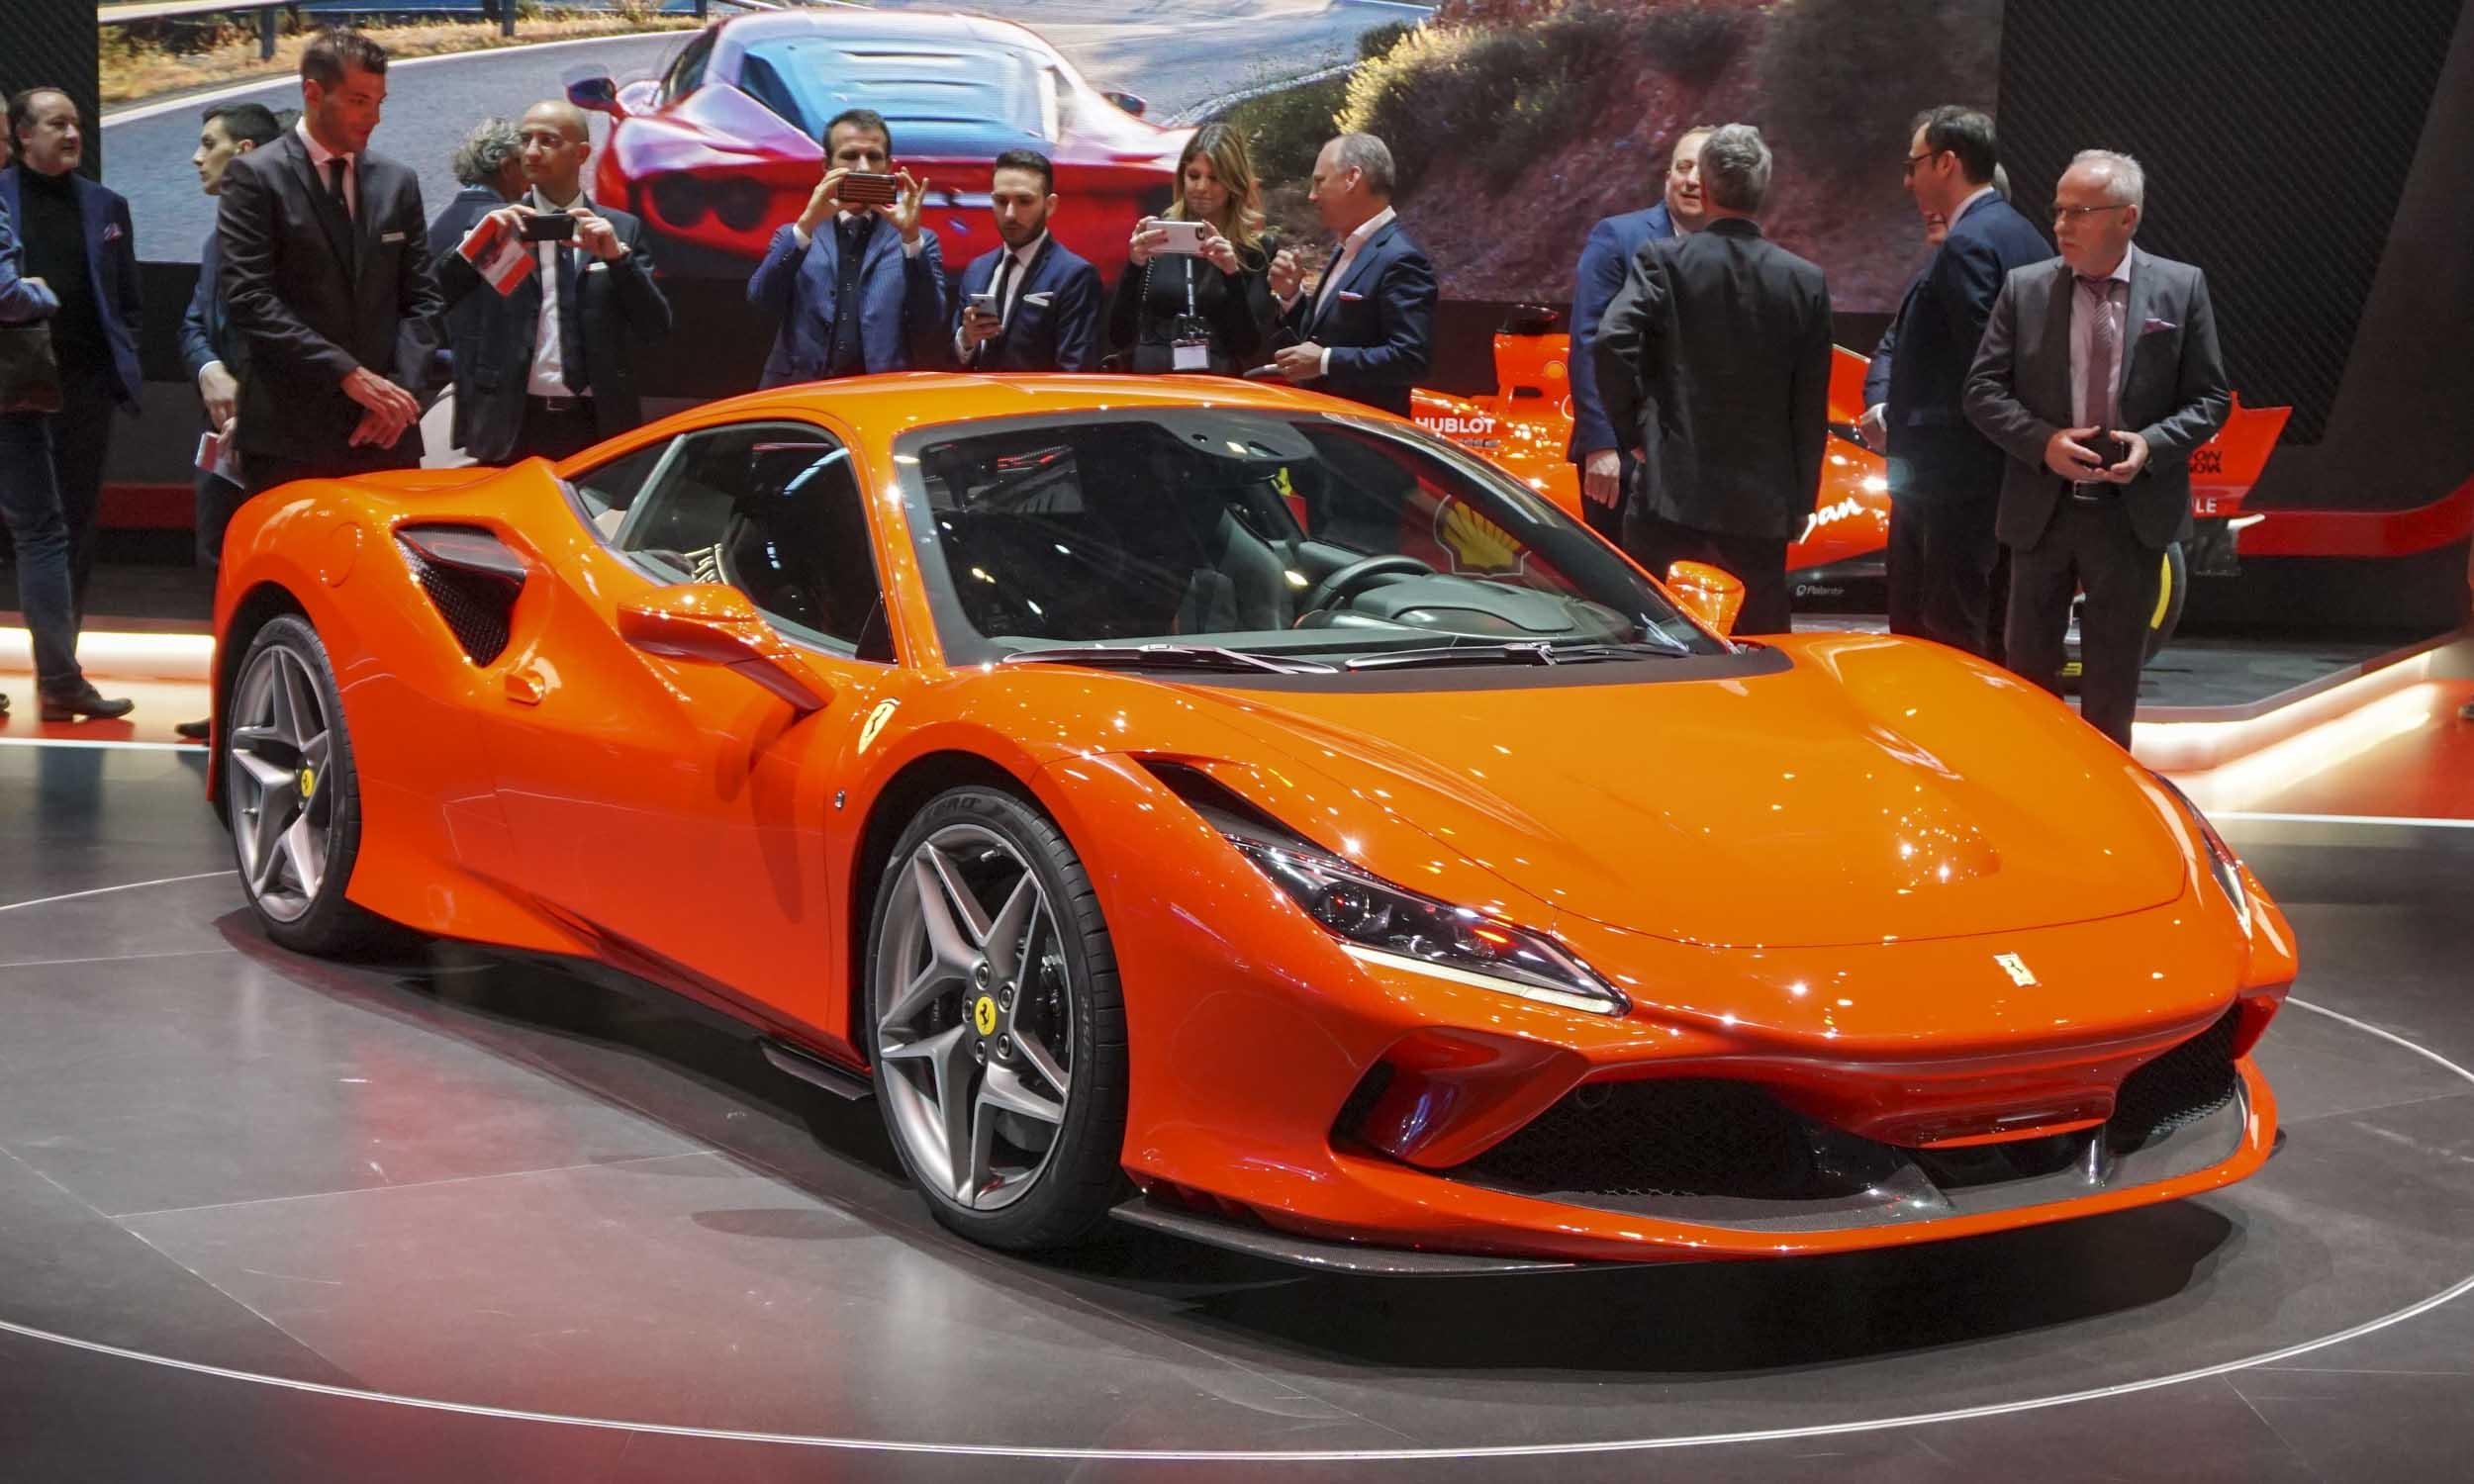 2019 Geneva Motor Show: Ferrari F8 Tributo